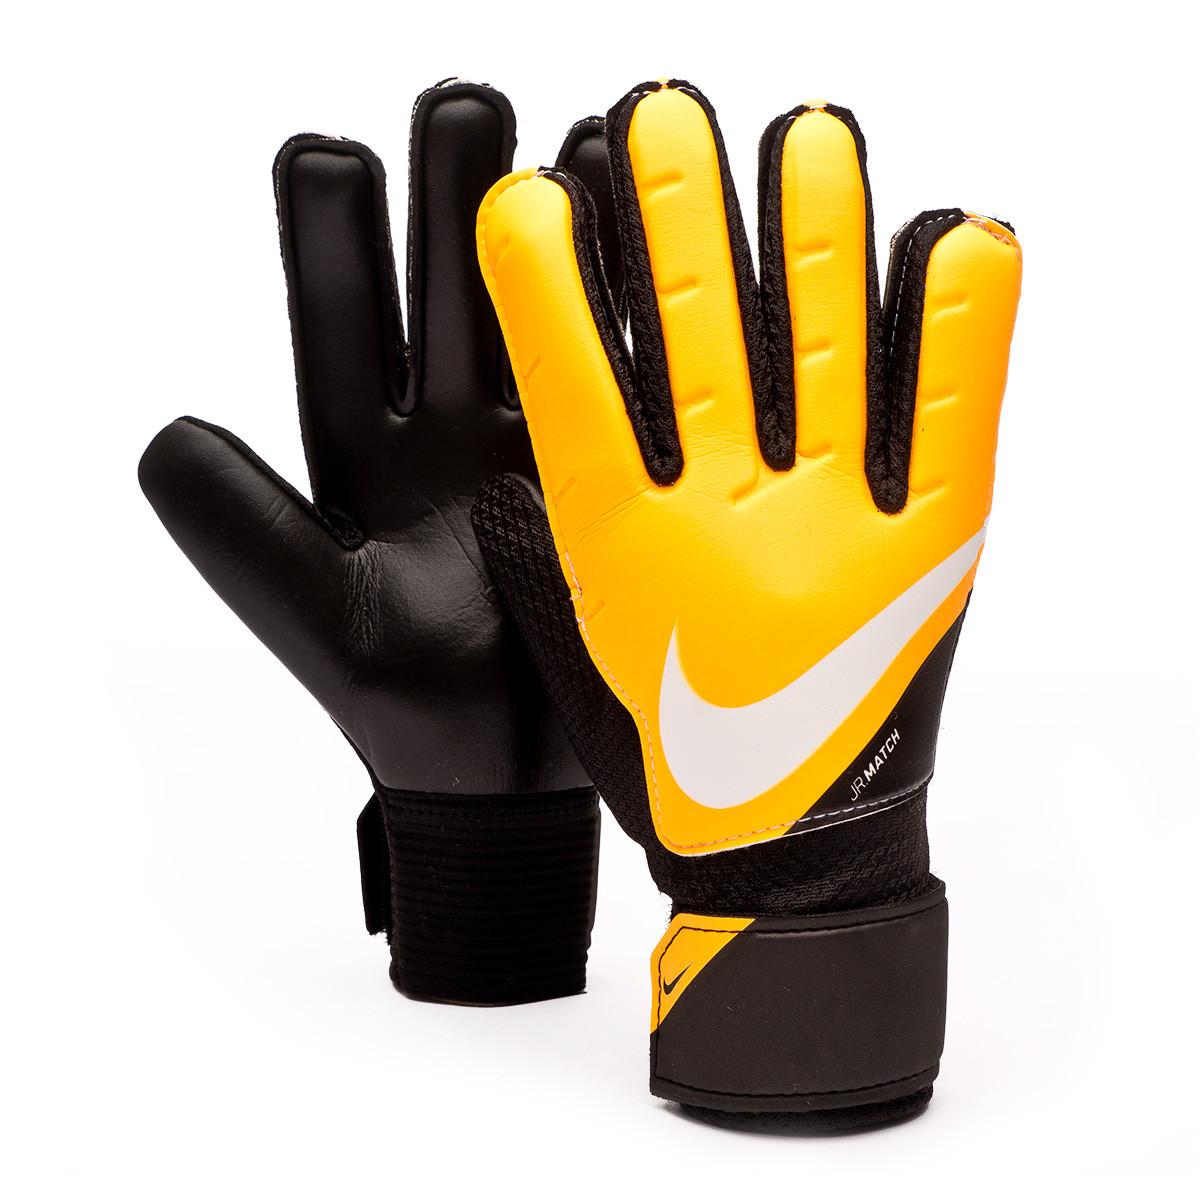 Comprensión ola Etna  Glove Nike Match Niño Black-Laser orange-White - Football store Fútbol  Emotion